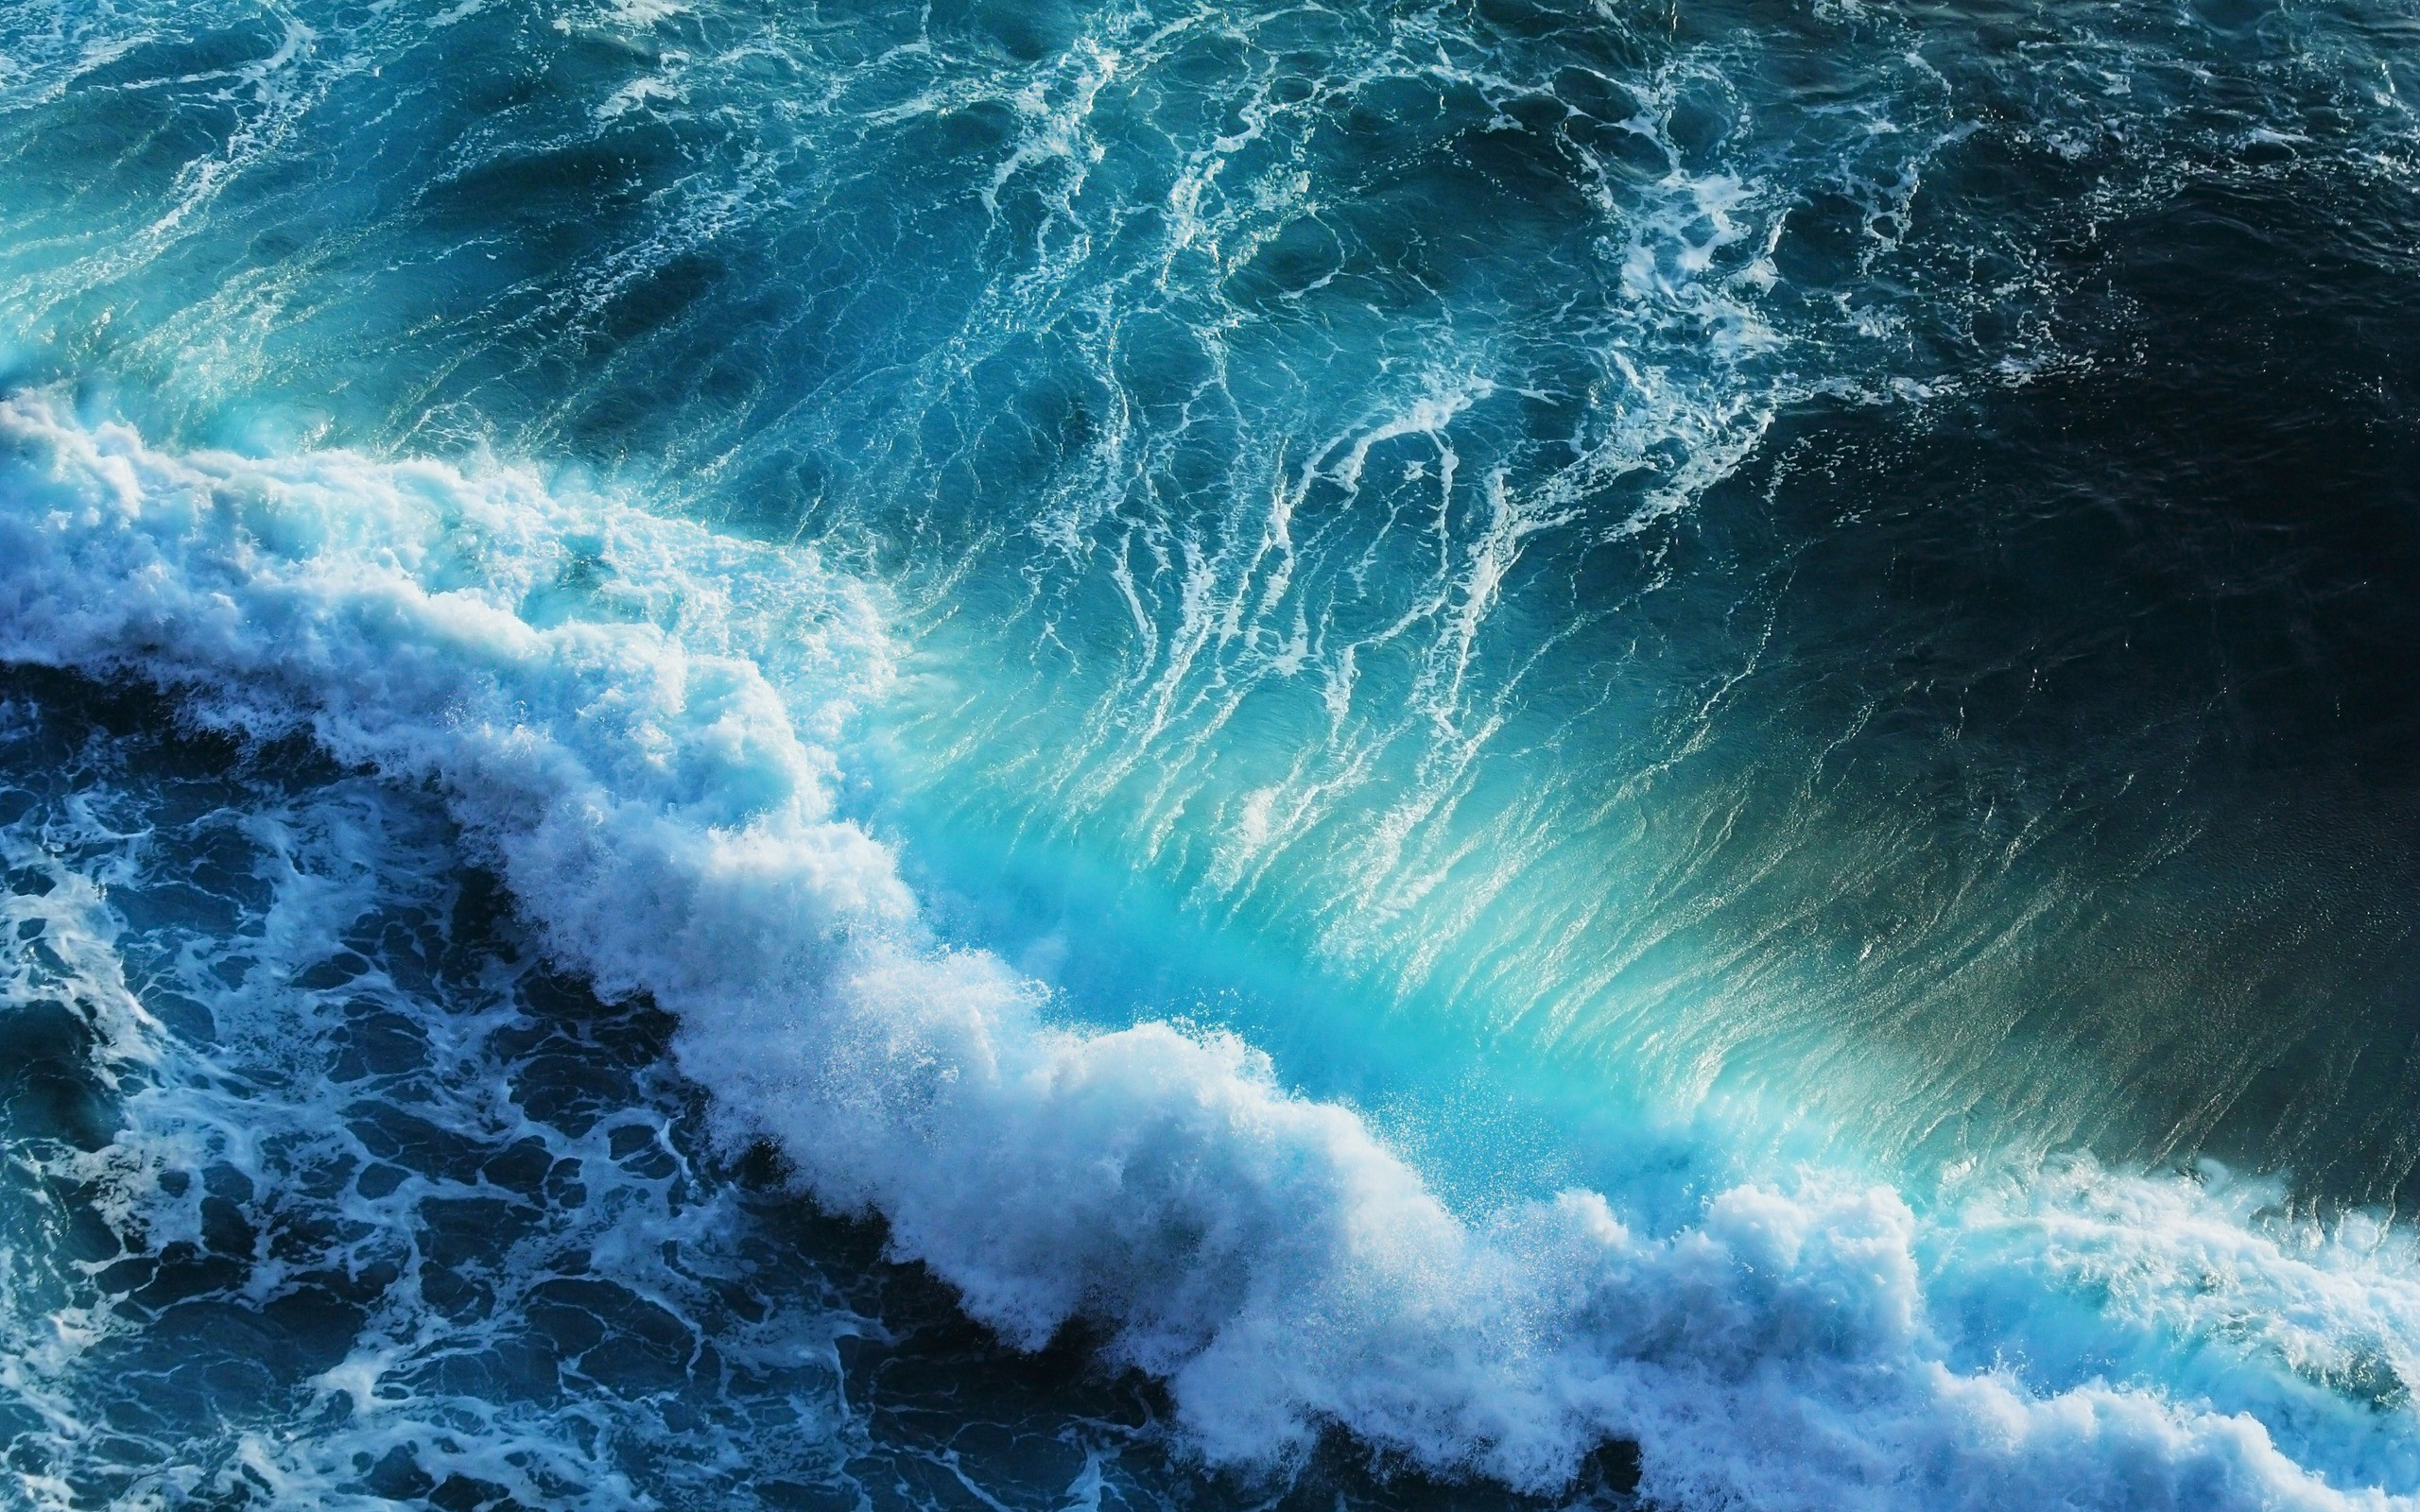 Ocean Wave Wallpaper Free Download